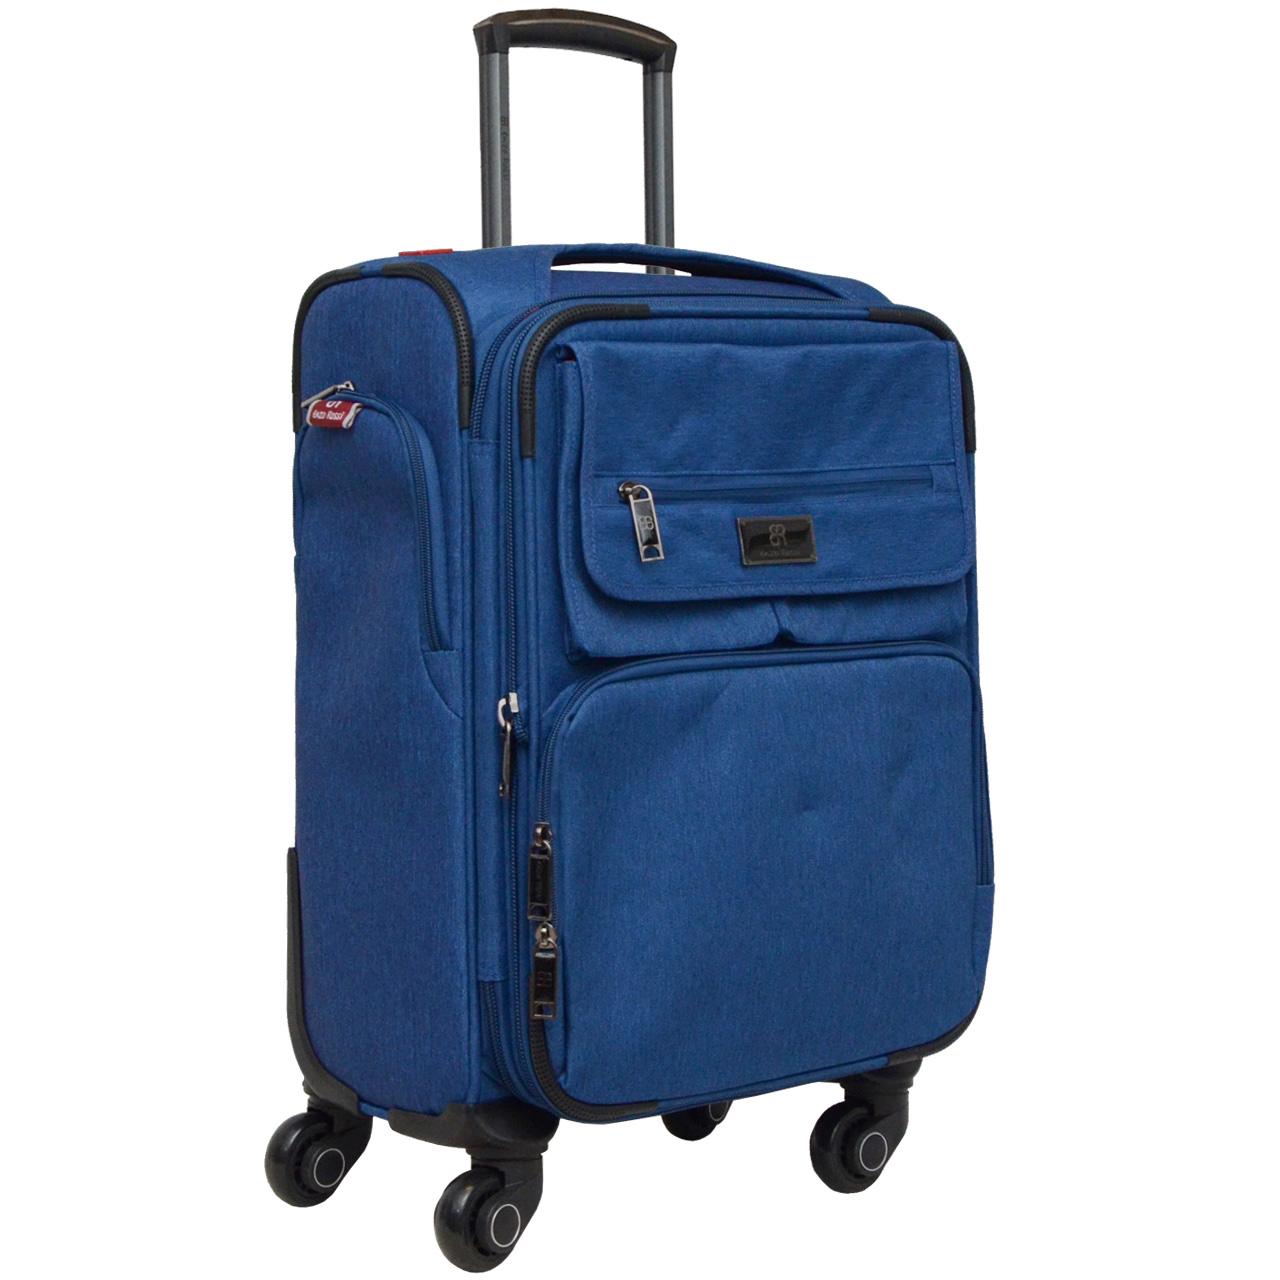 چمدان انزو رسی مدل ER 9565 - 20